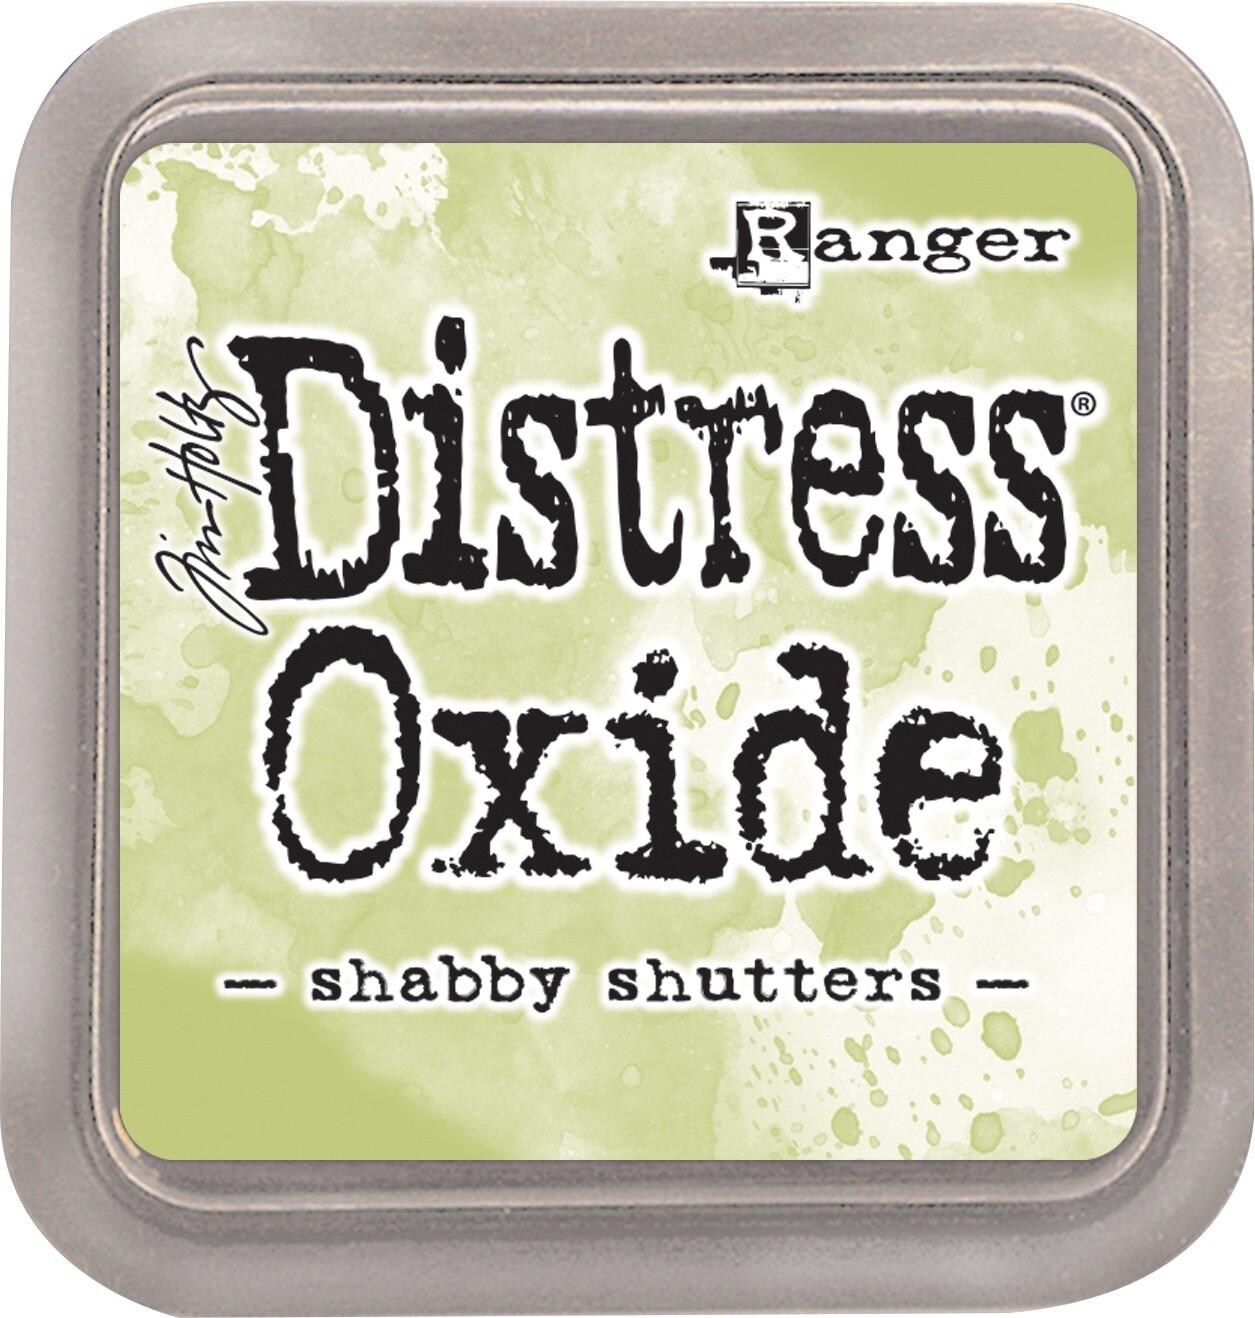 Tim Holtz Distress SHABBY SHUTTERS Oxides Ink Pad